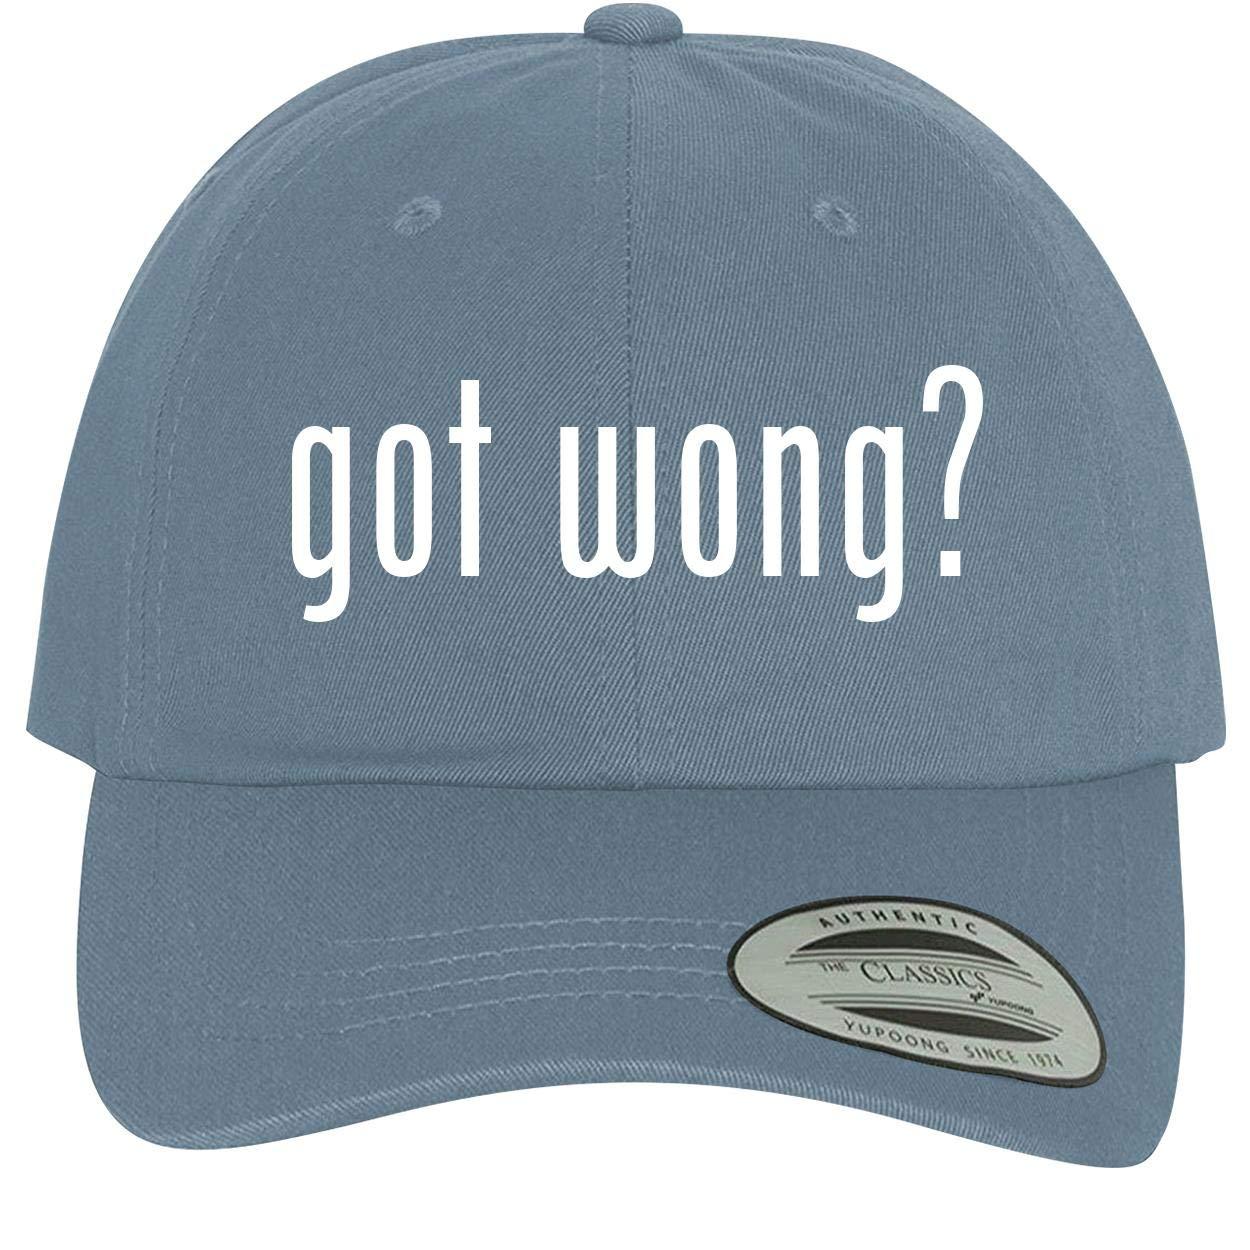 Comfortable Dad Hat Baseball Cap BH Cool Designs got Wong?